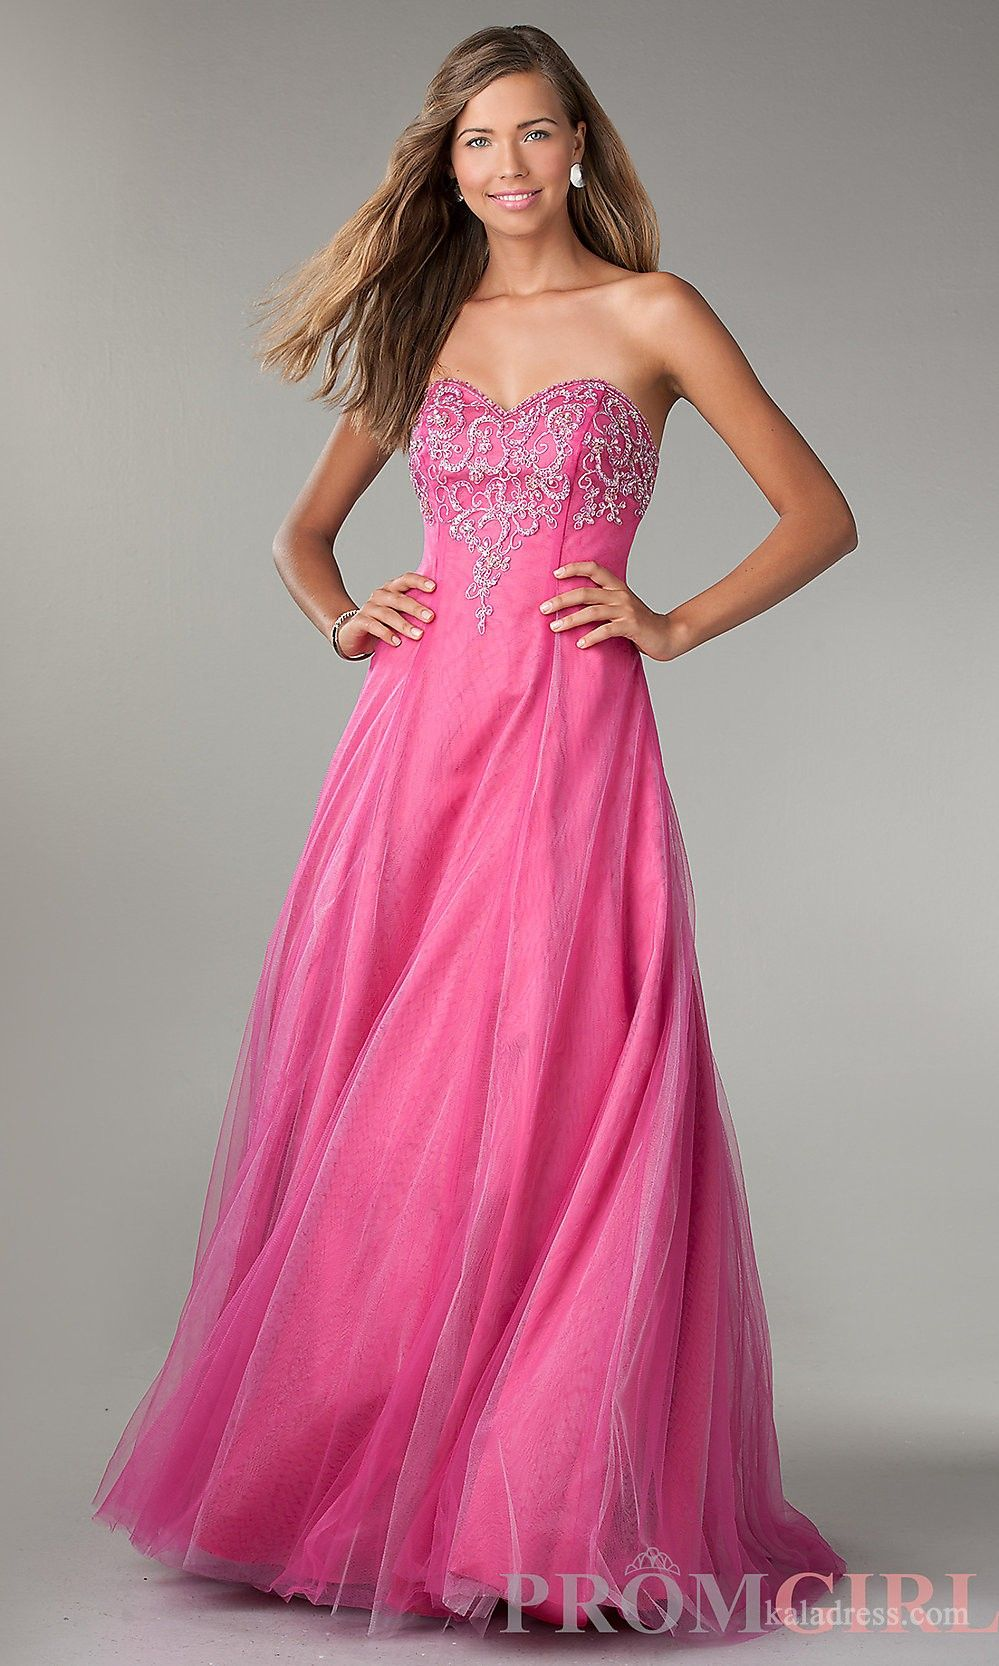 2015 top fashion #prom #dresses http://www.kaladress.com ...